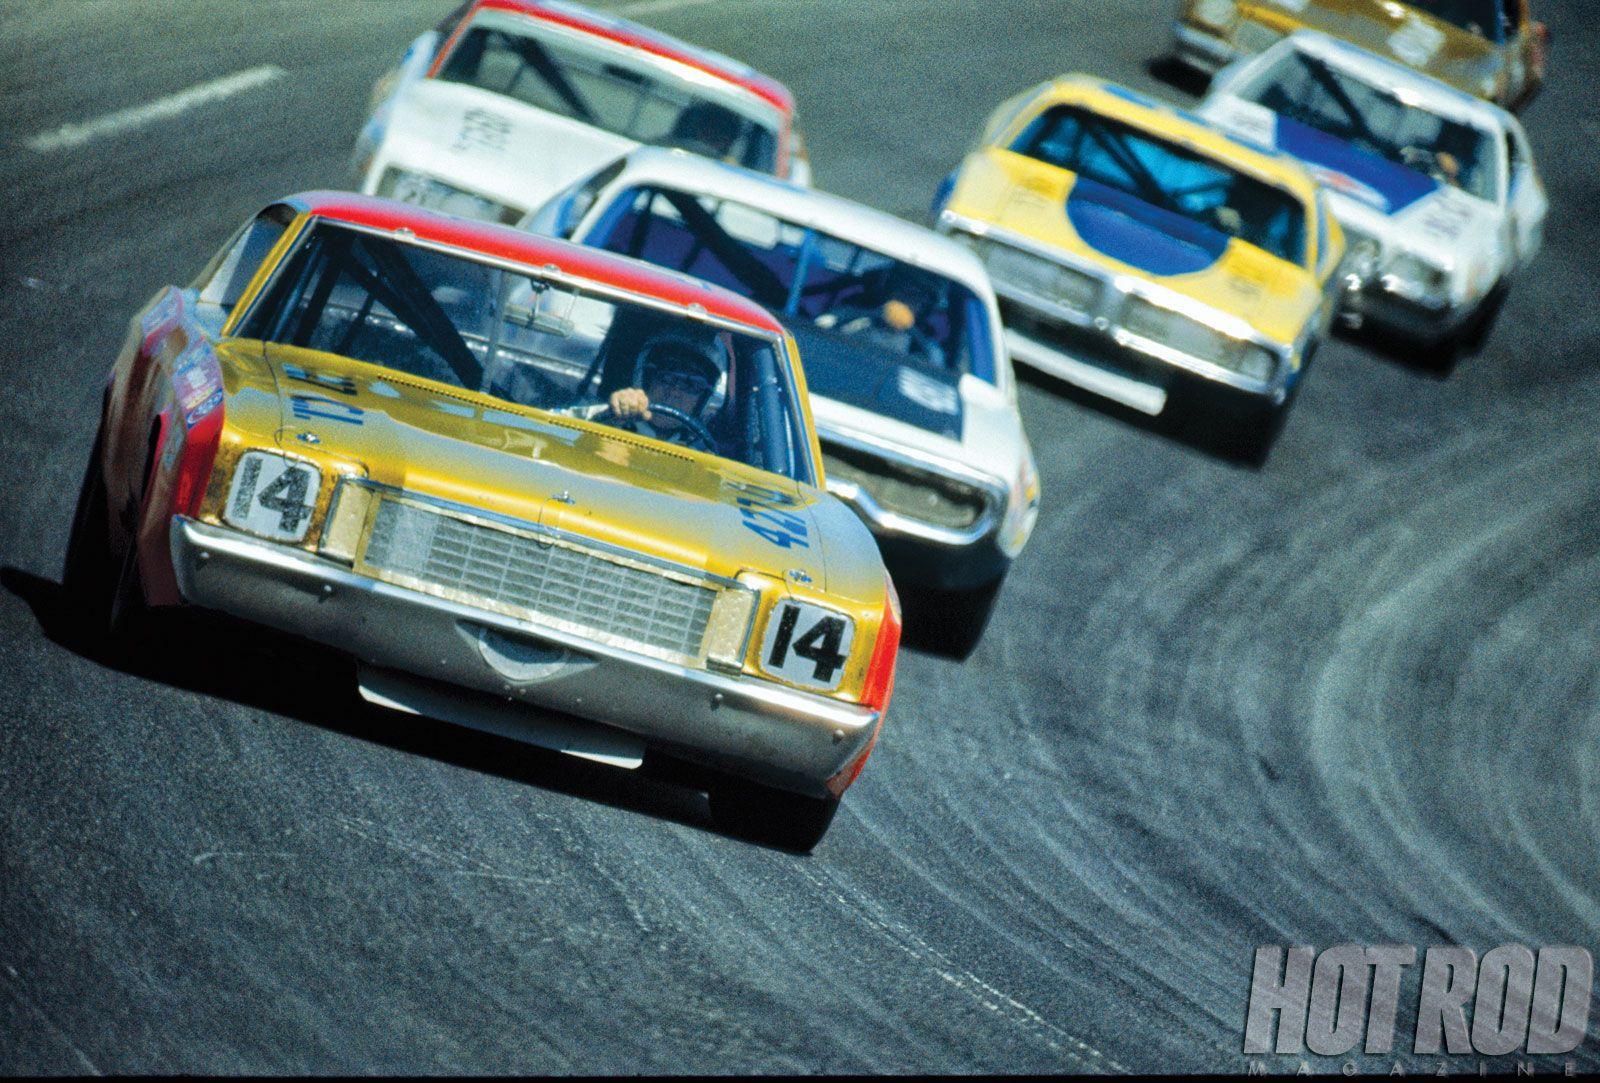 vintage nascar pics | Hrdp 1205 History Of When Stock Cars Nascar ...